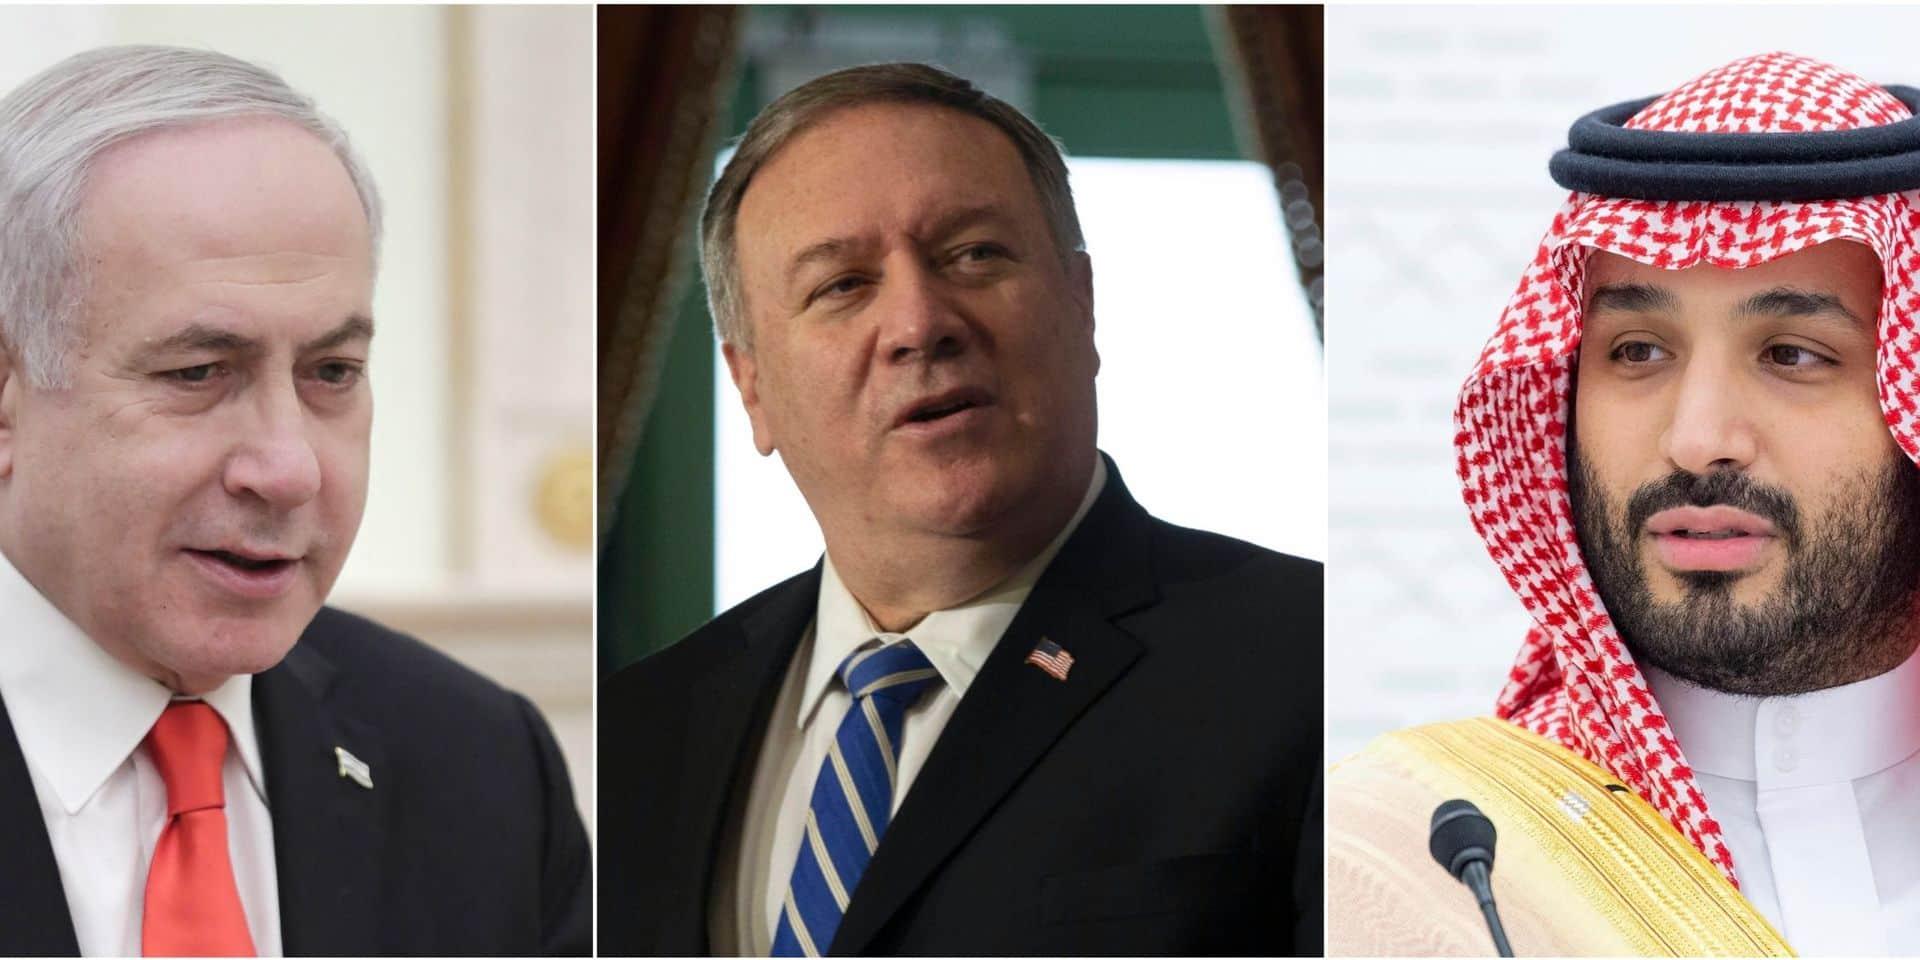 Rencontre secrète entre Benjamin Netanyahou, Mike Pompeo et Mohammed ben Salmane : normalisation en vue ?